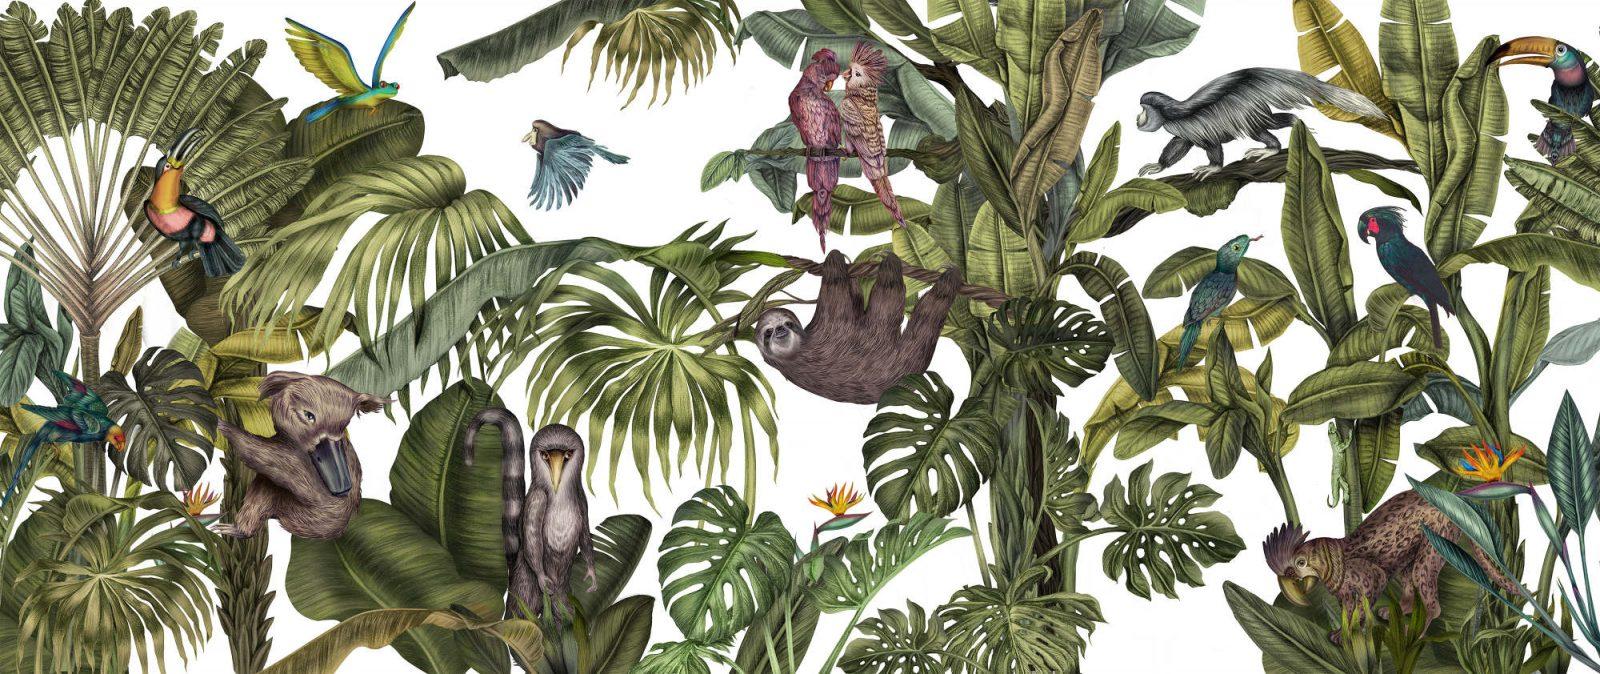 A Lush Landscape of Botanical Life by Karina Eibatova